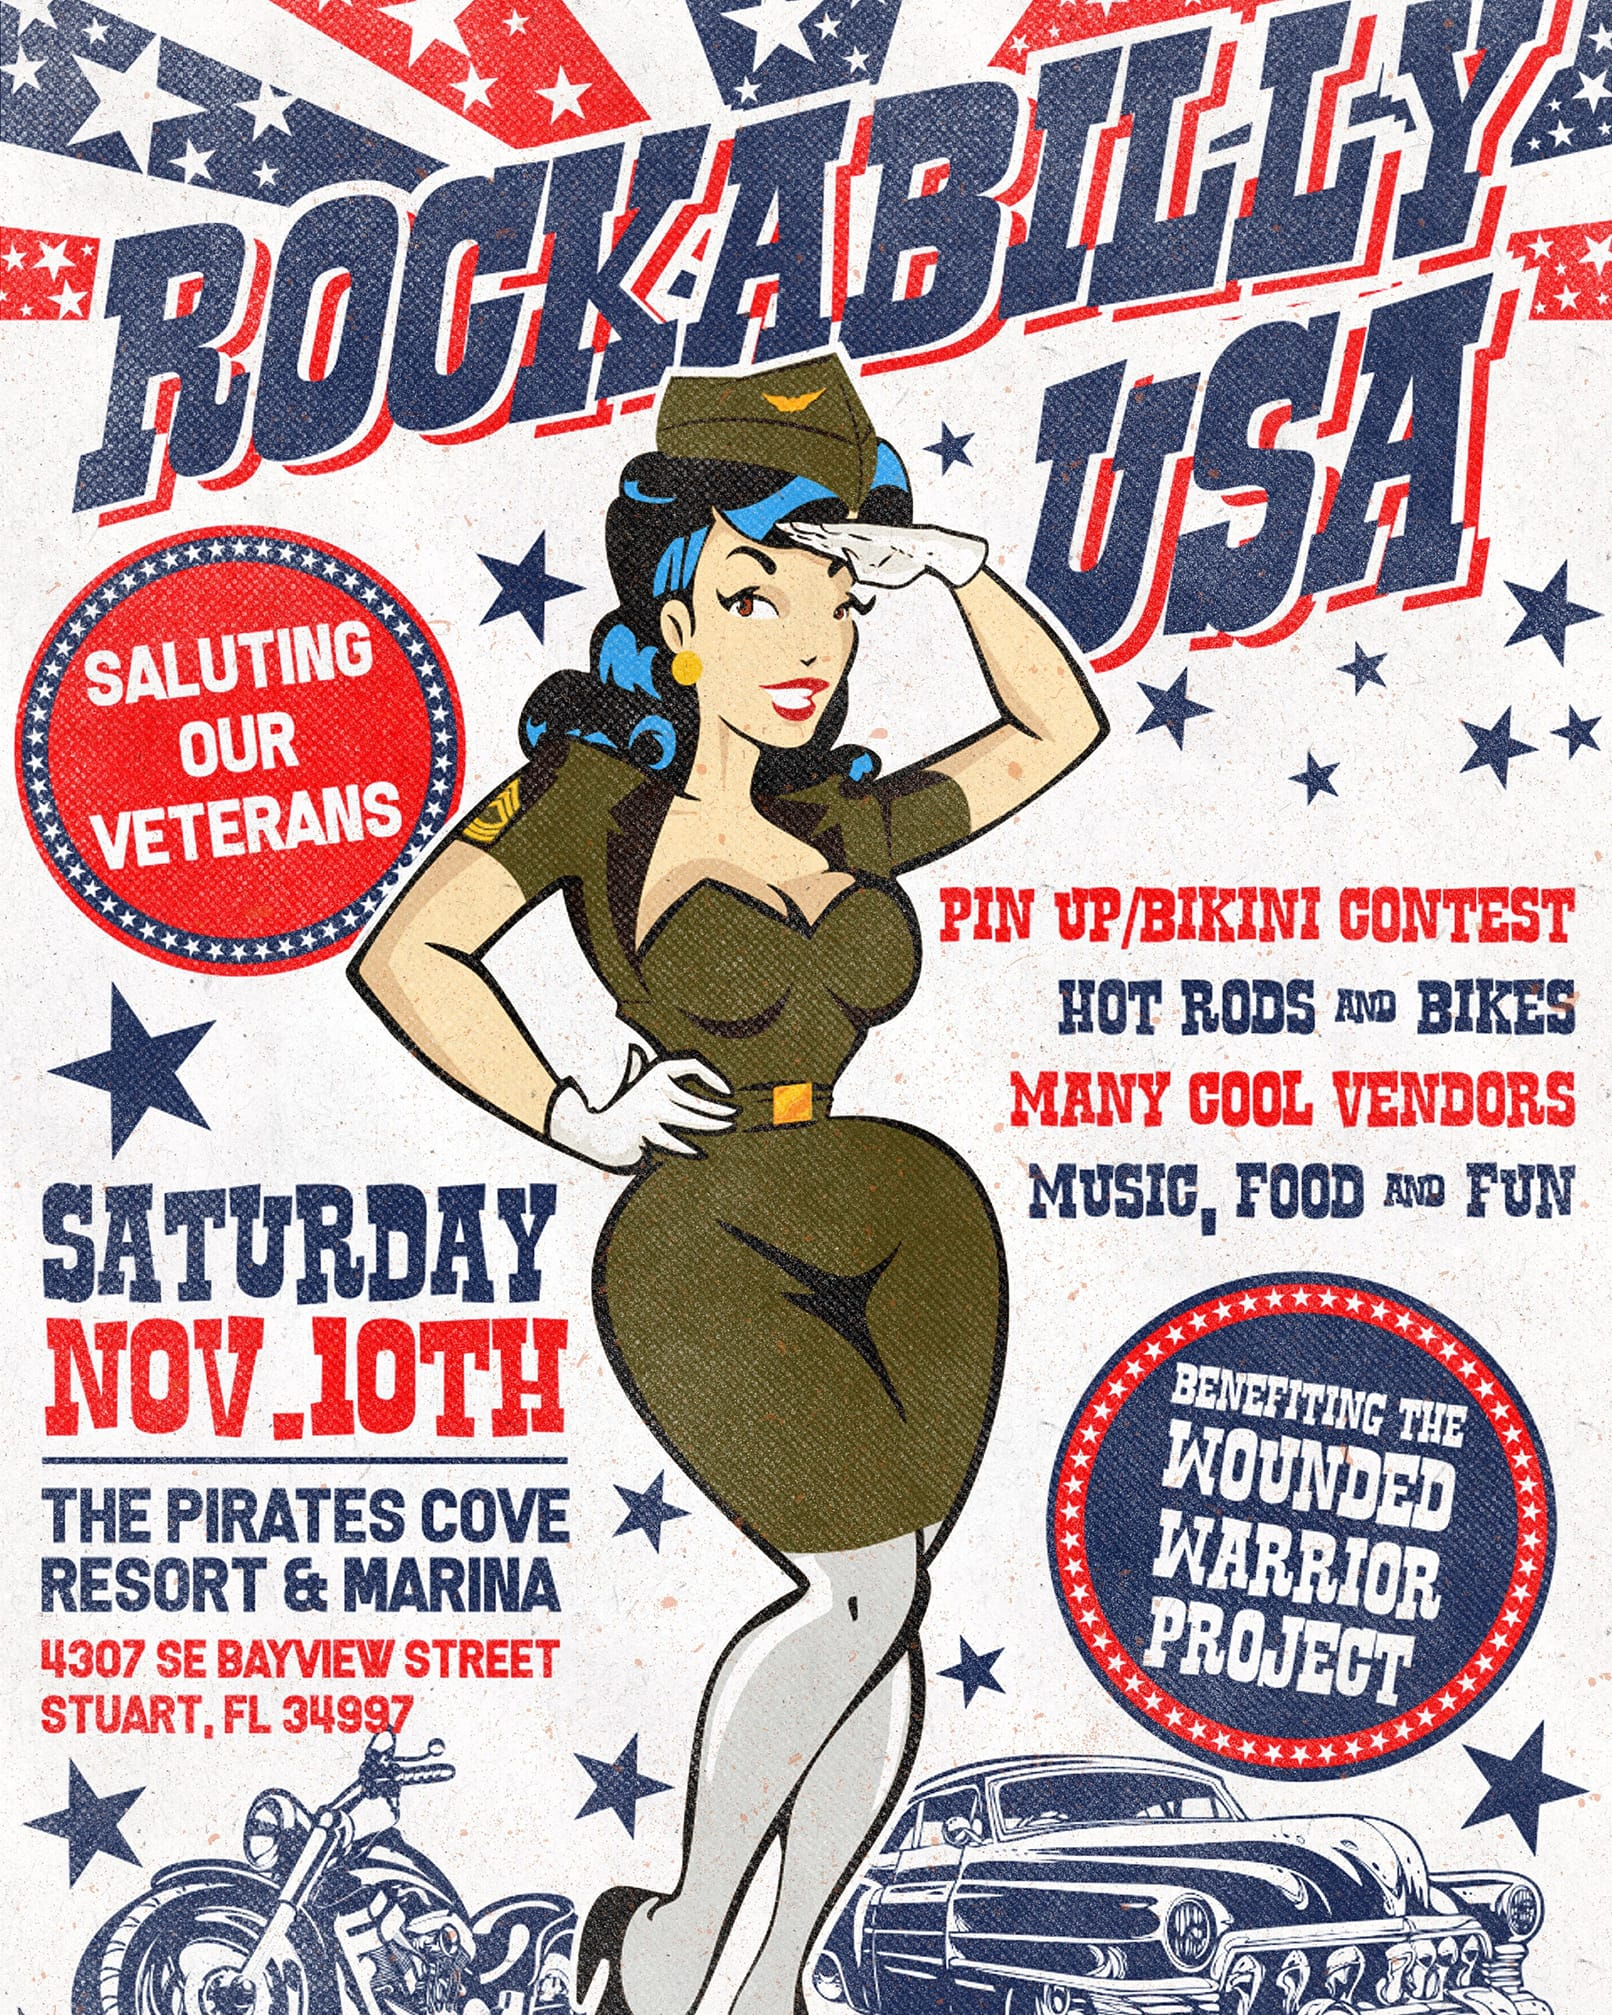 Rockabilly USA Wounded Warrior – Stuart, FL